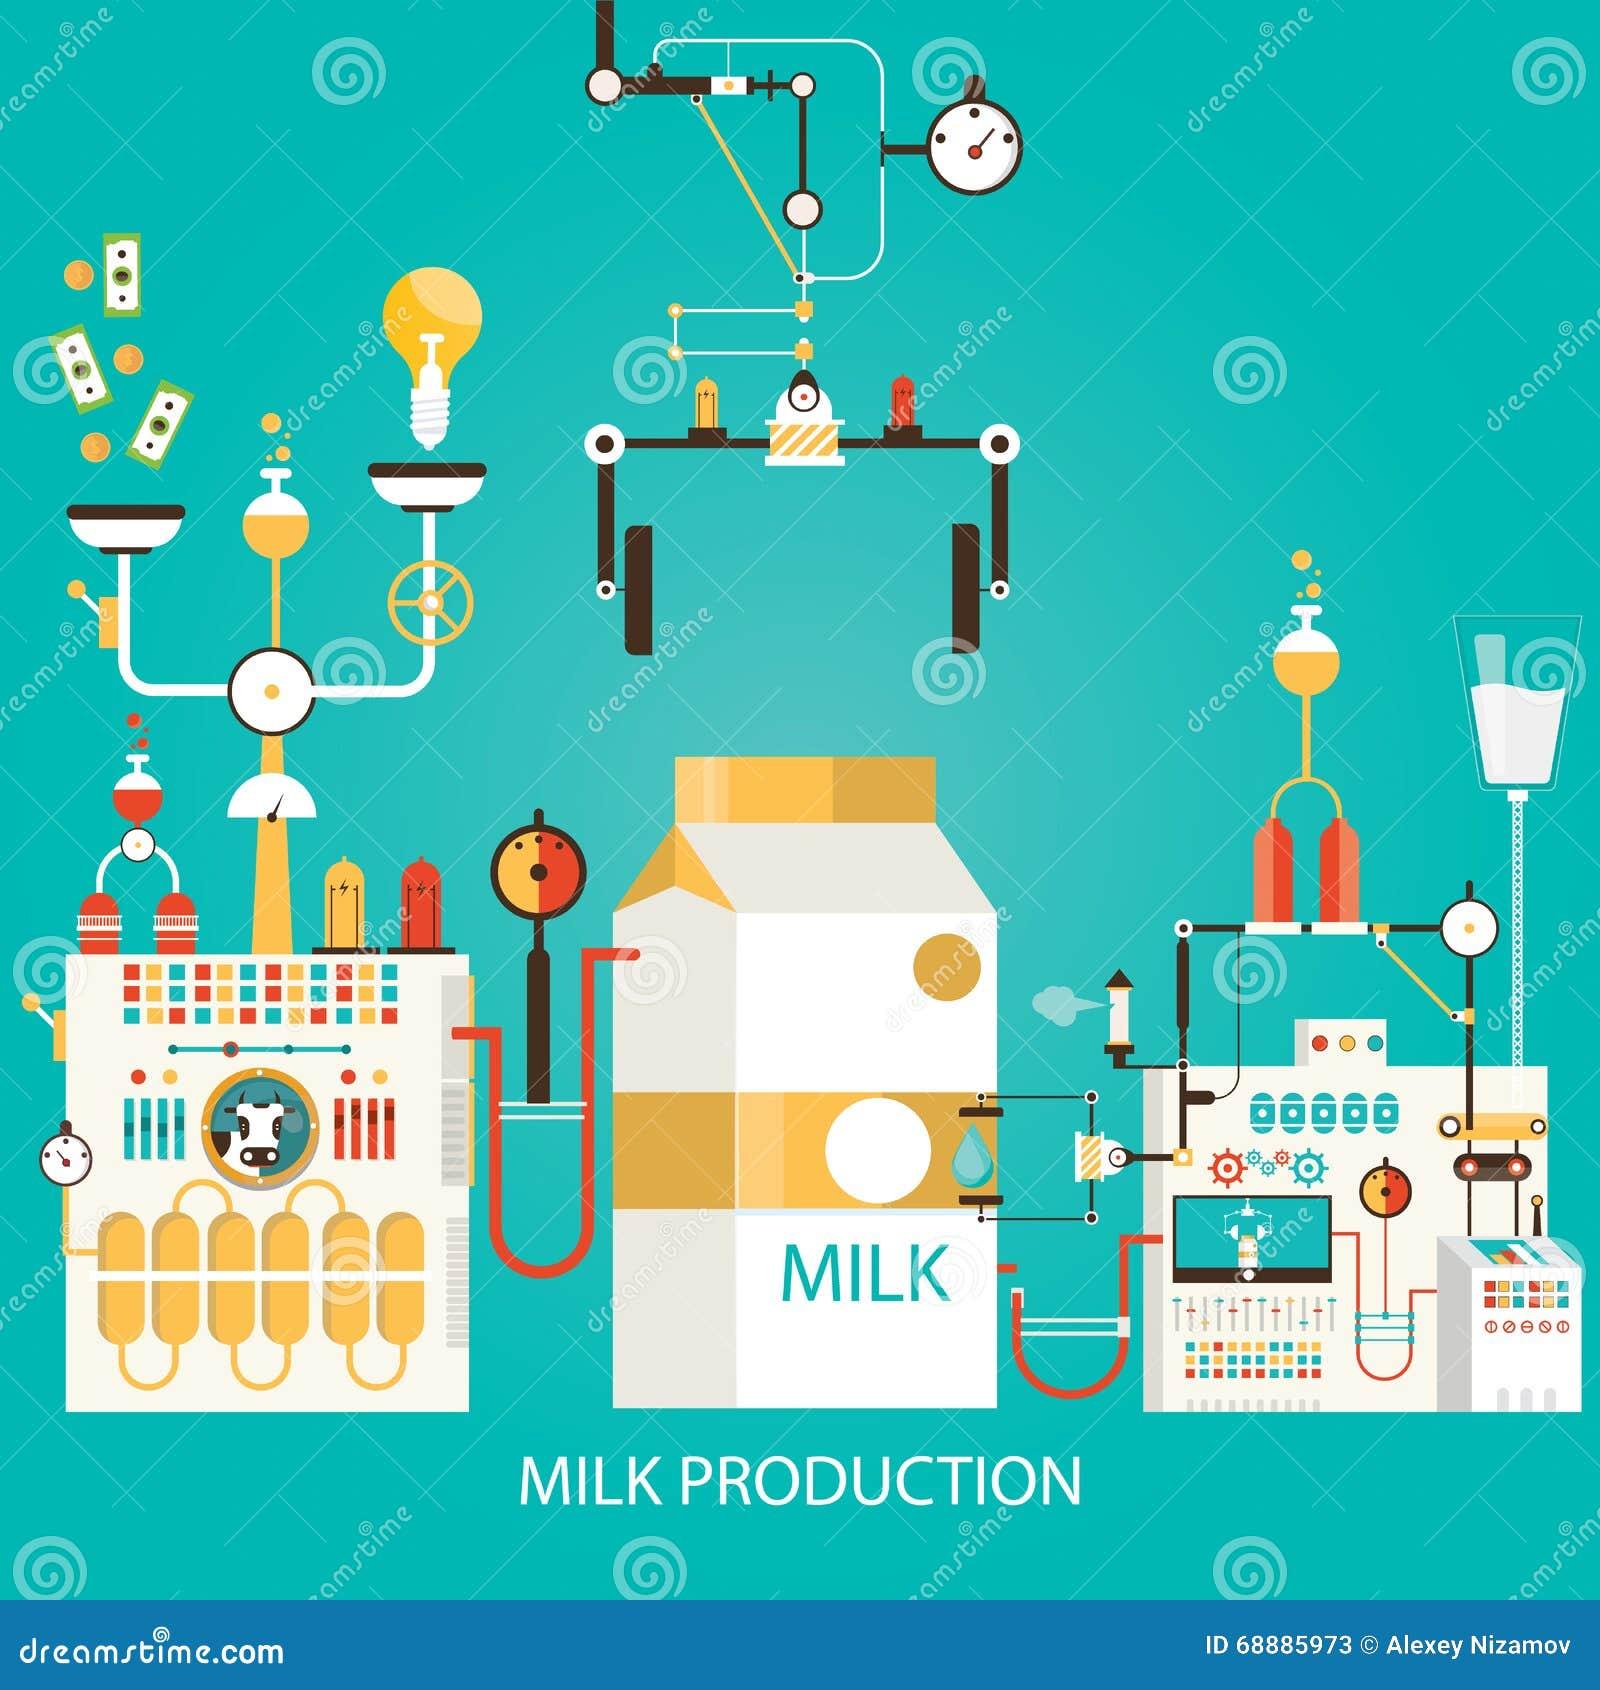 Vector Illustration Of Milk Production. Factory Of Milk